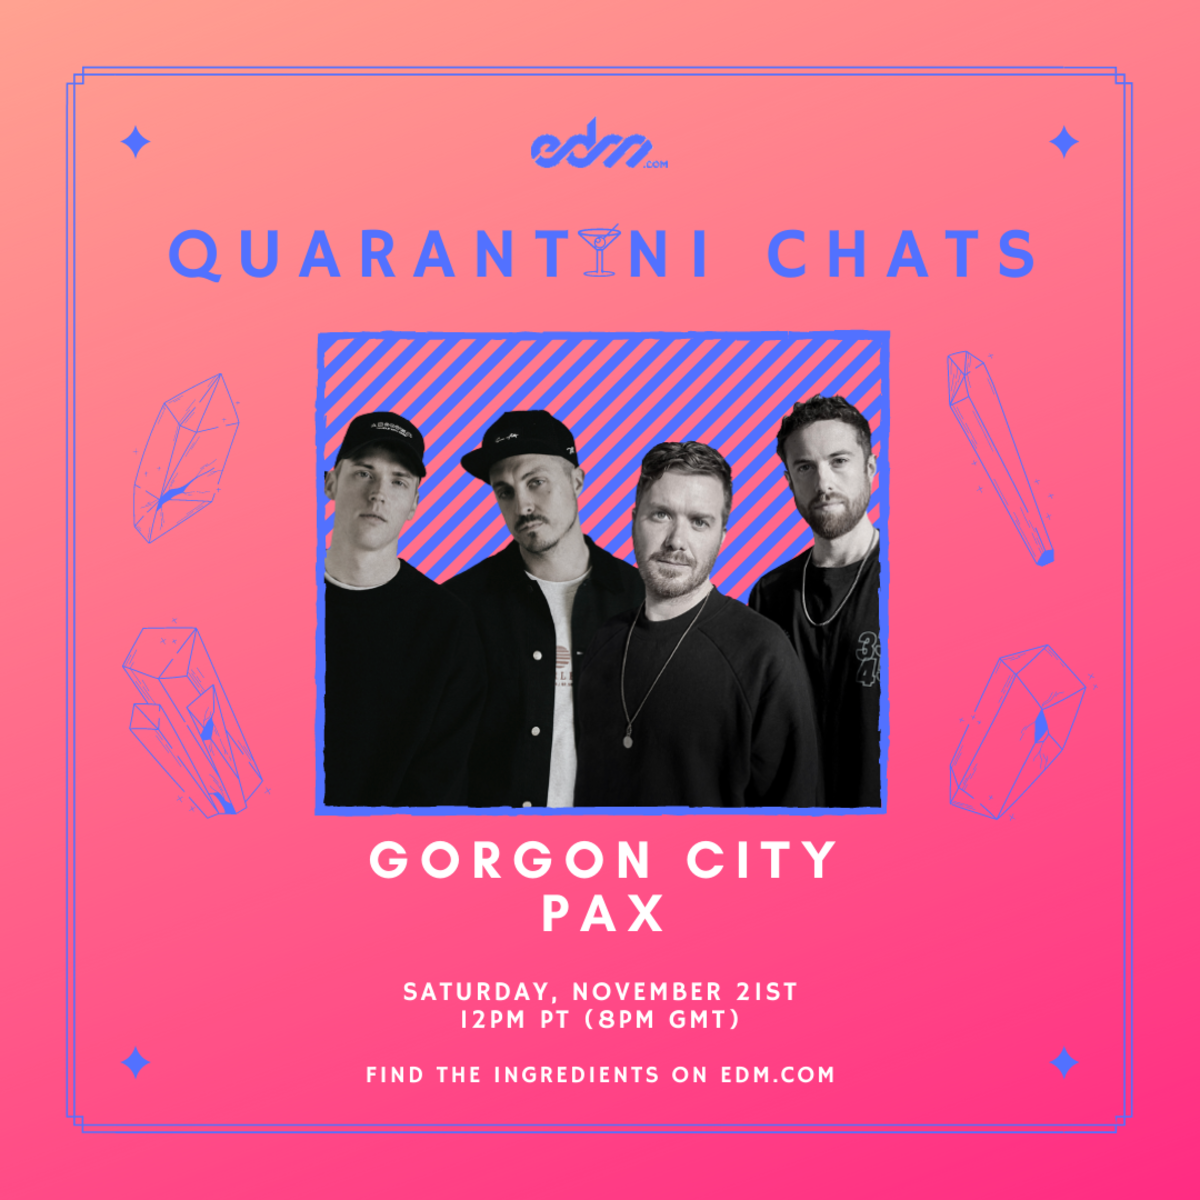 Gorgon_PAX Quarantini